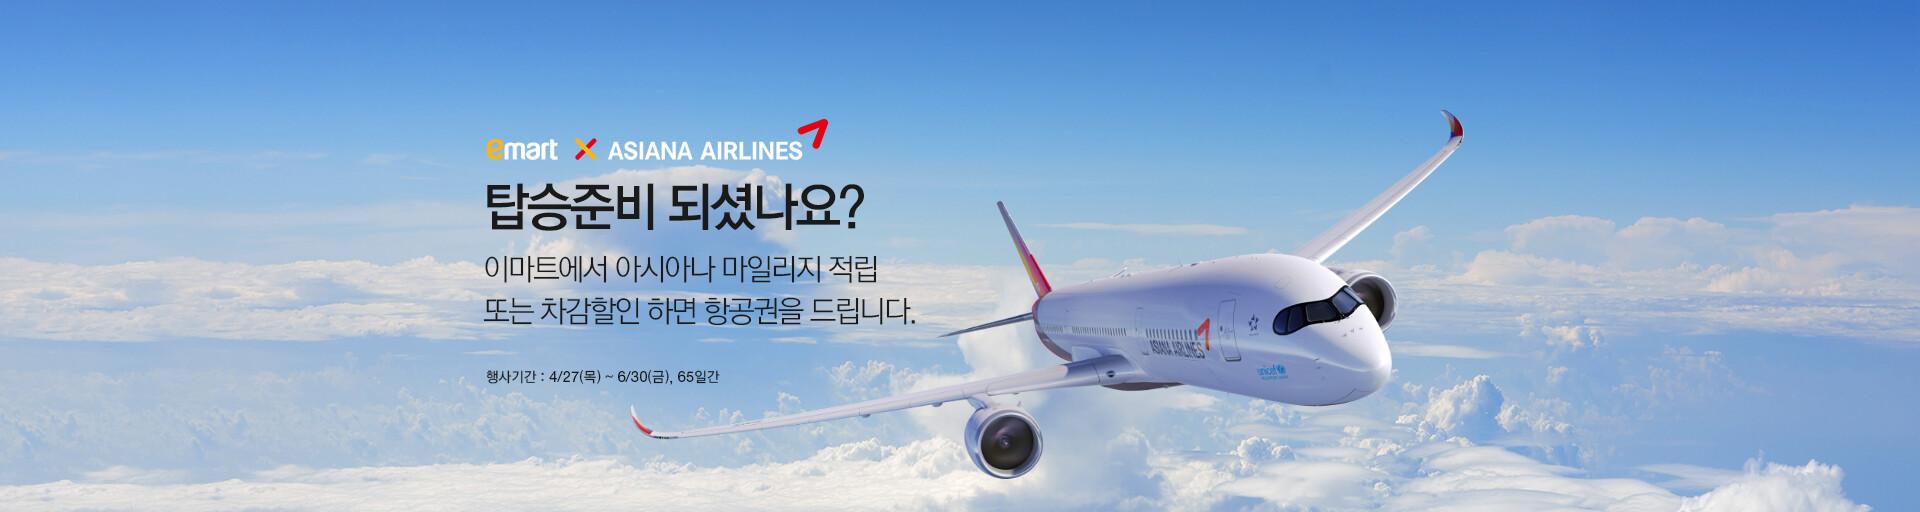 emart x asiana alrlines 탑승준비 되셨나요? 이마트에서 아시아나 마일리지 적립 또는 차감할인 하면 항공권을 드립니다.